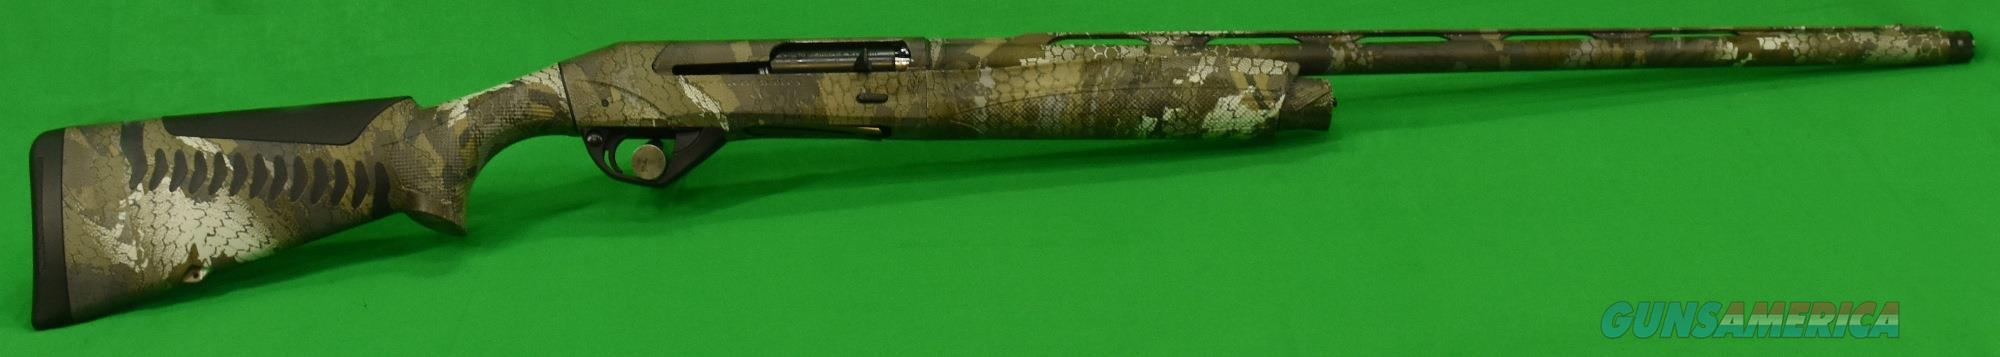 10361 Benelli Super Black Eagle 3 Gore Optifade Timber 12 Ga 28-3.5In  Guns > Shotguns > Benelli Shotguns > Sporting